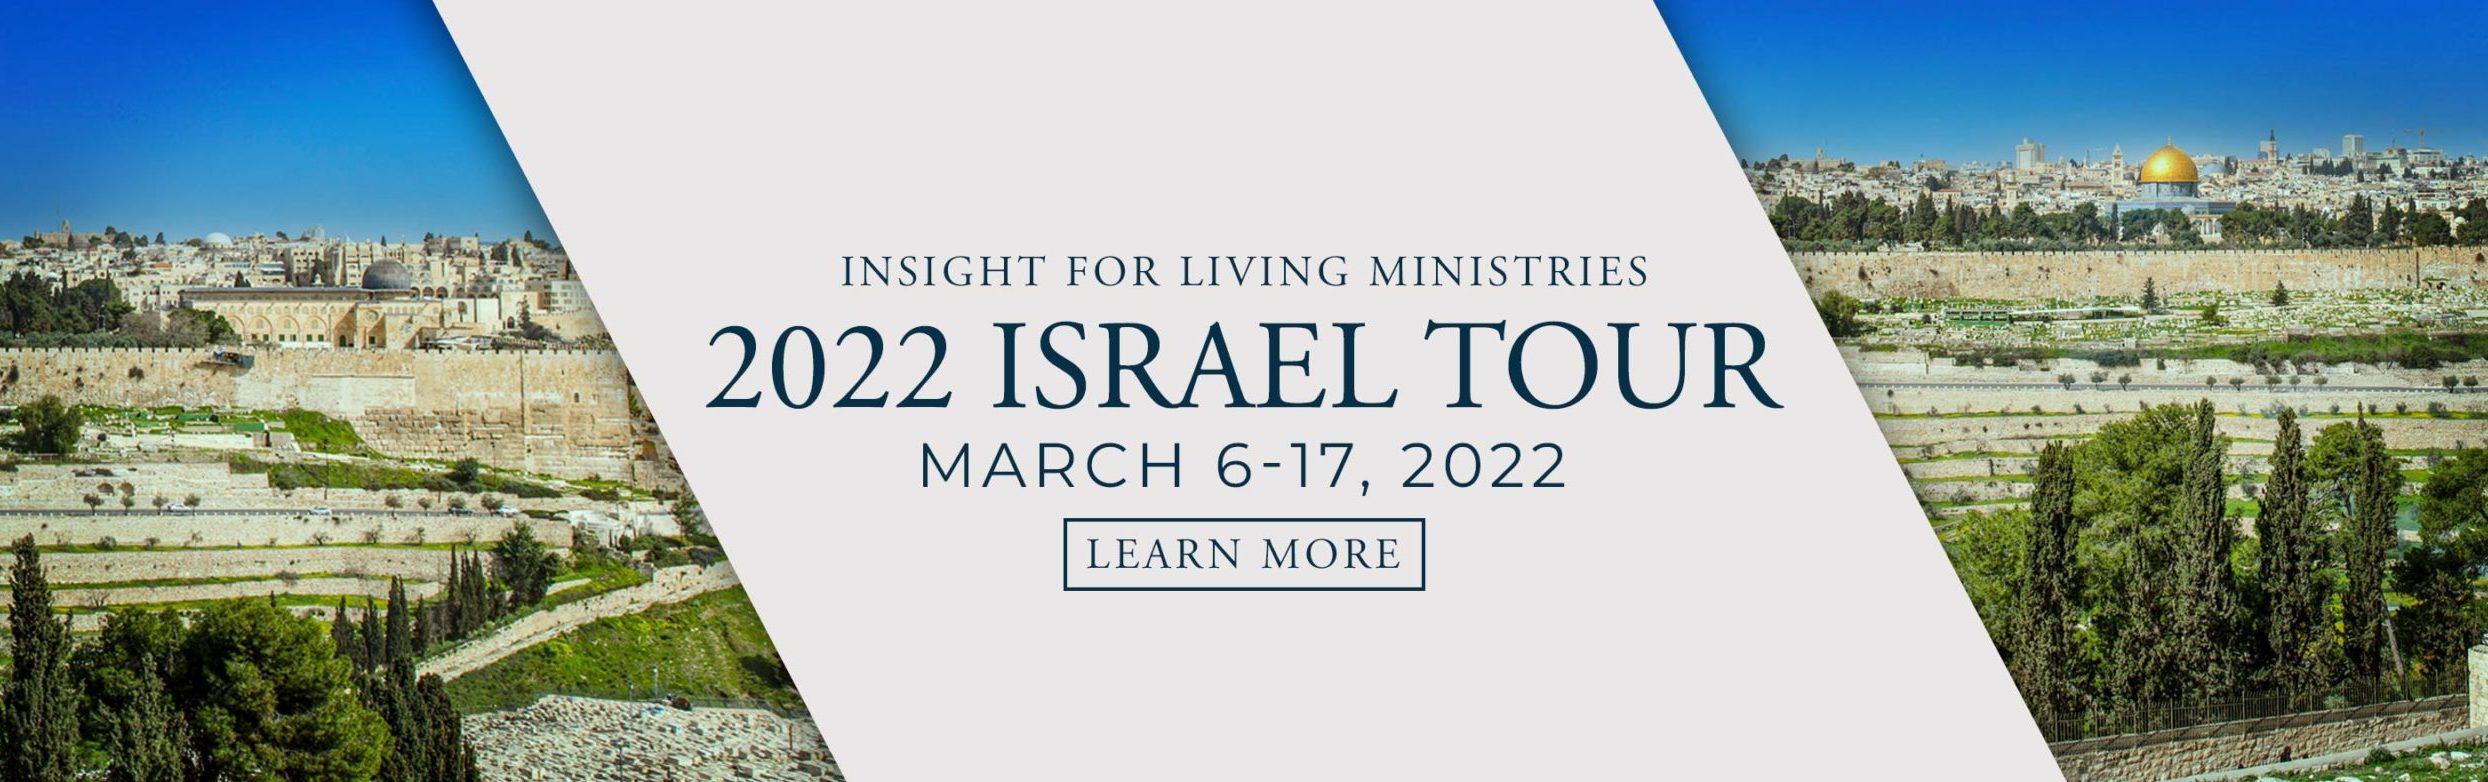 Israel 2022 Tour